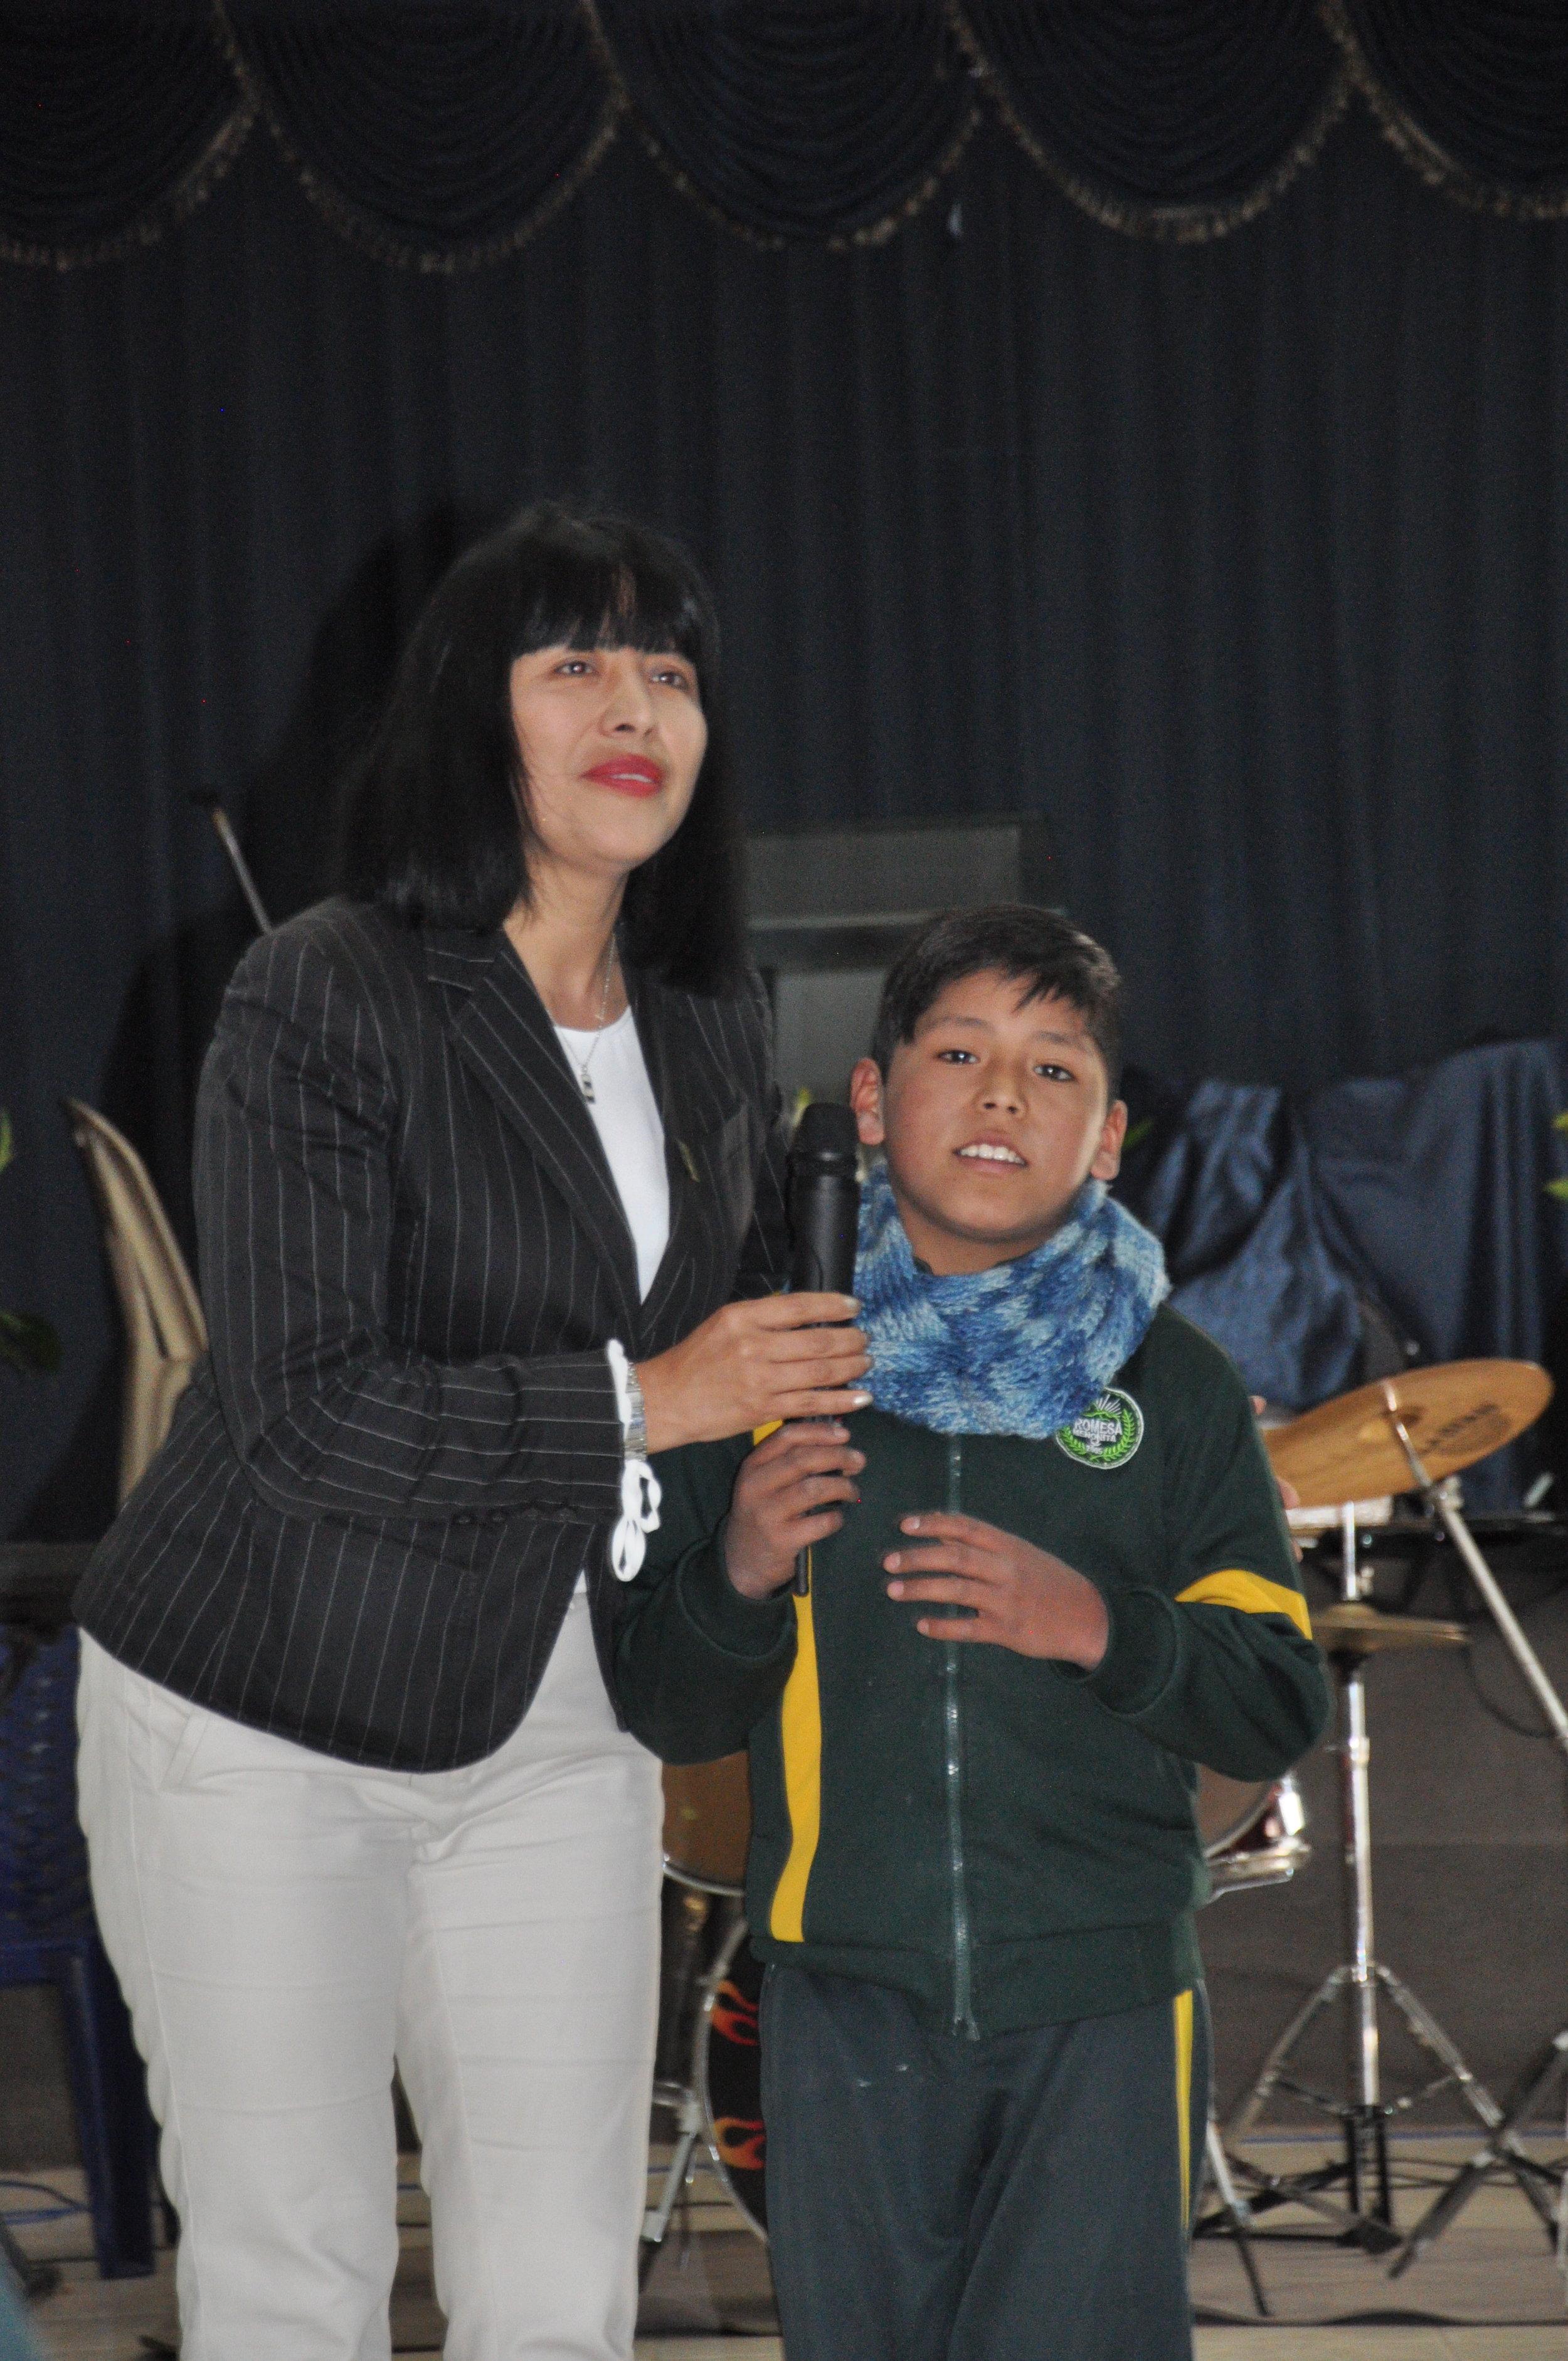 Promesa principal recognizing a student's birthday